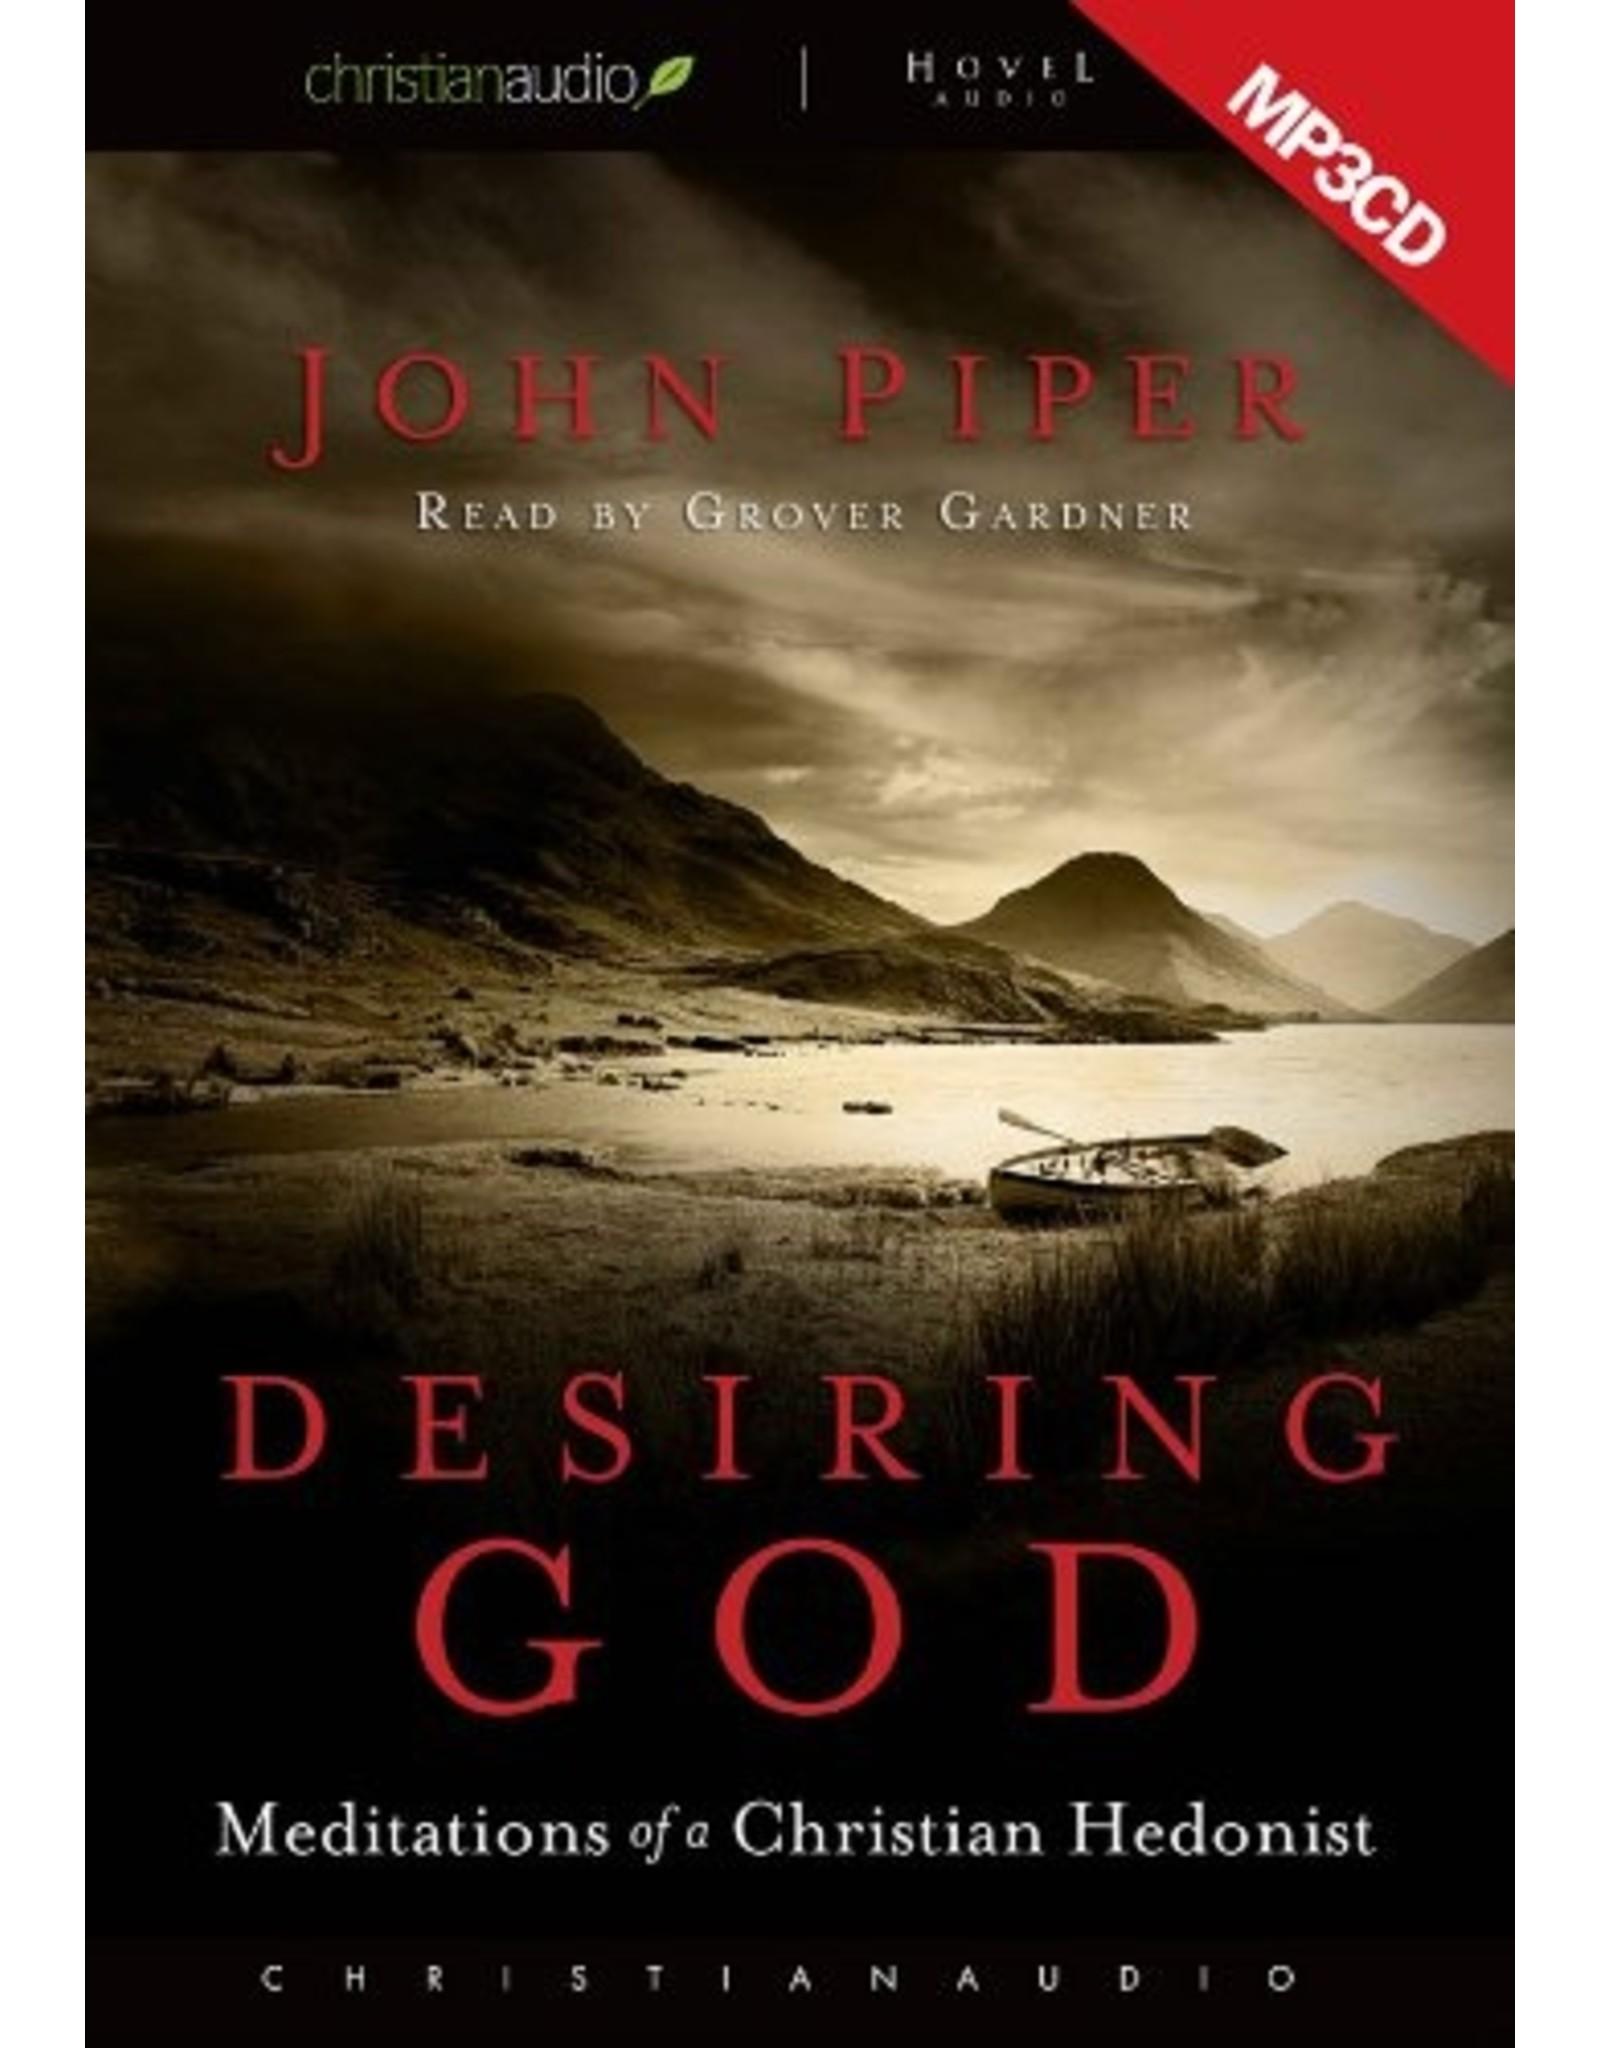 Hovel Audio Desiring God (MP3 Audio Book)